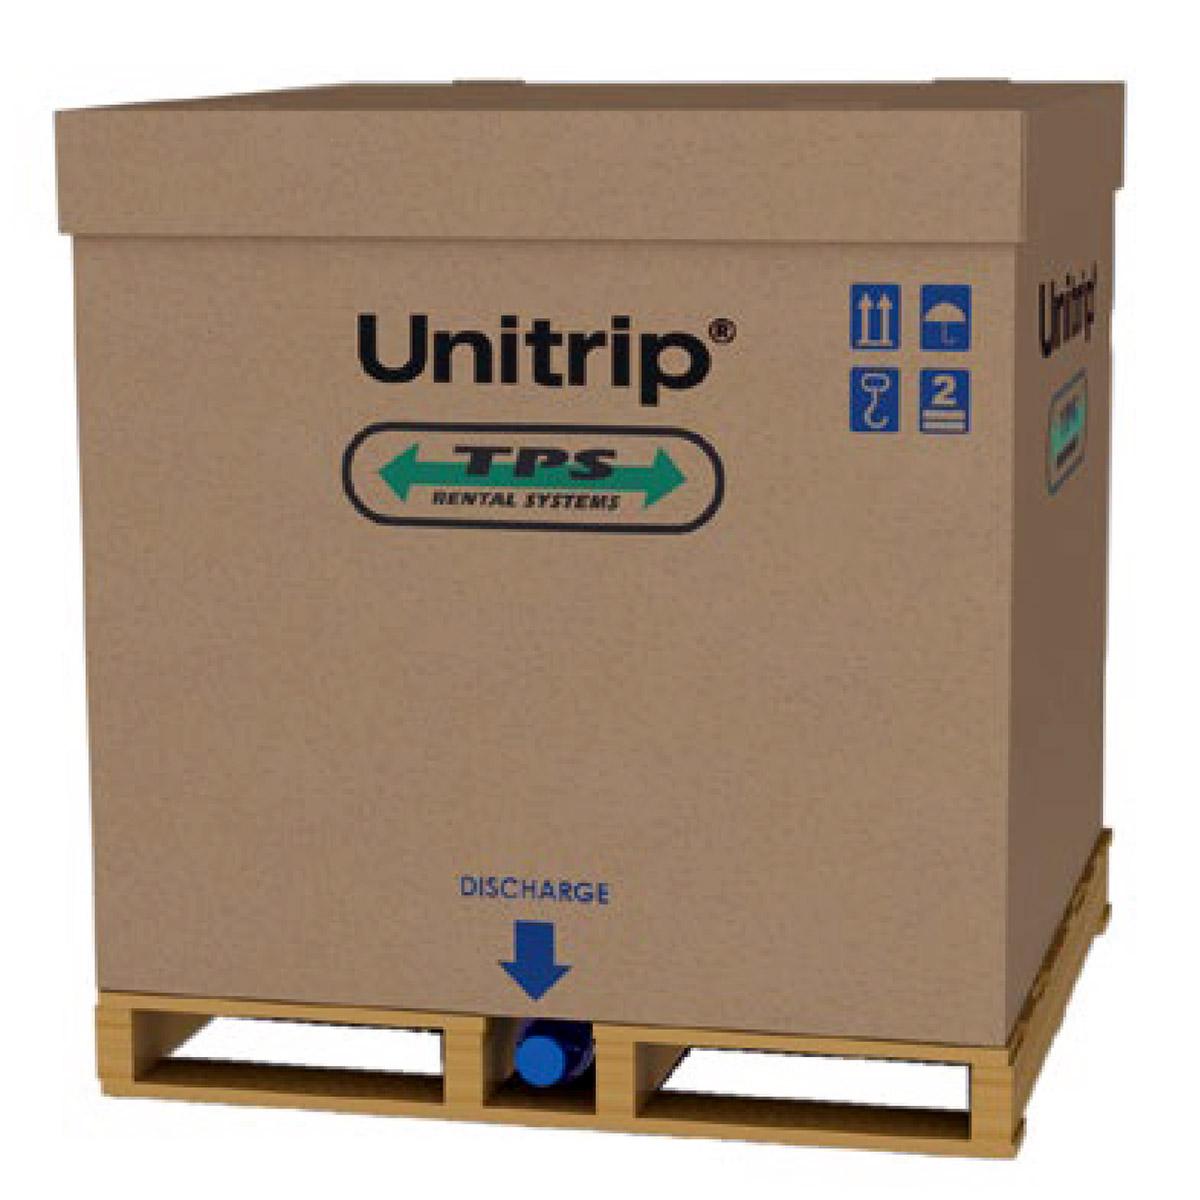 Unitrip 1000